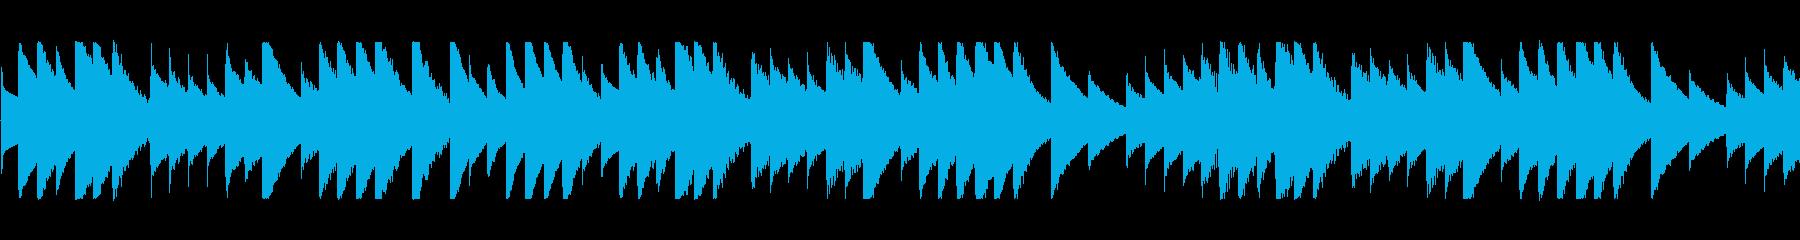 Okinawan folk song / Tinsagu nu Hana / Music box's reproduced waveform